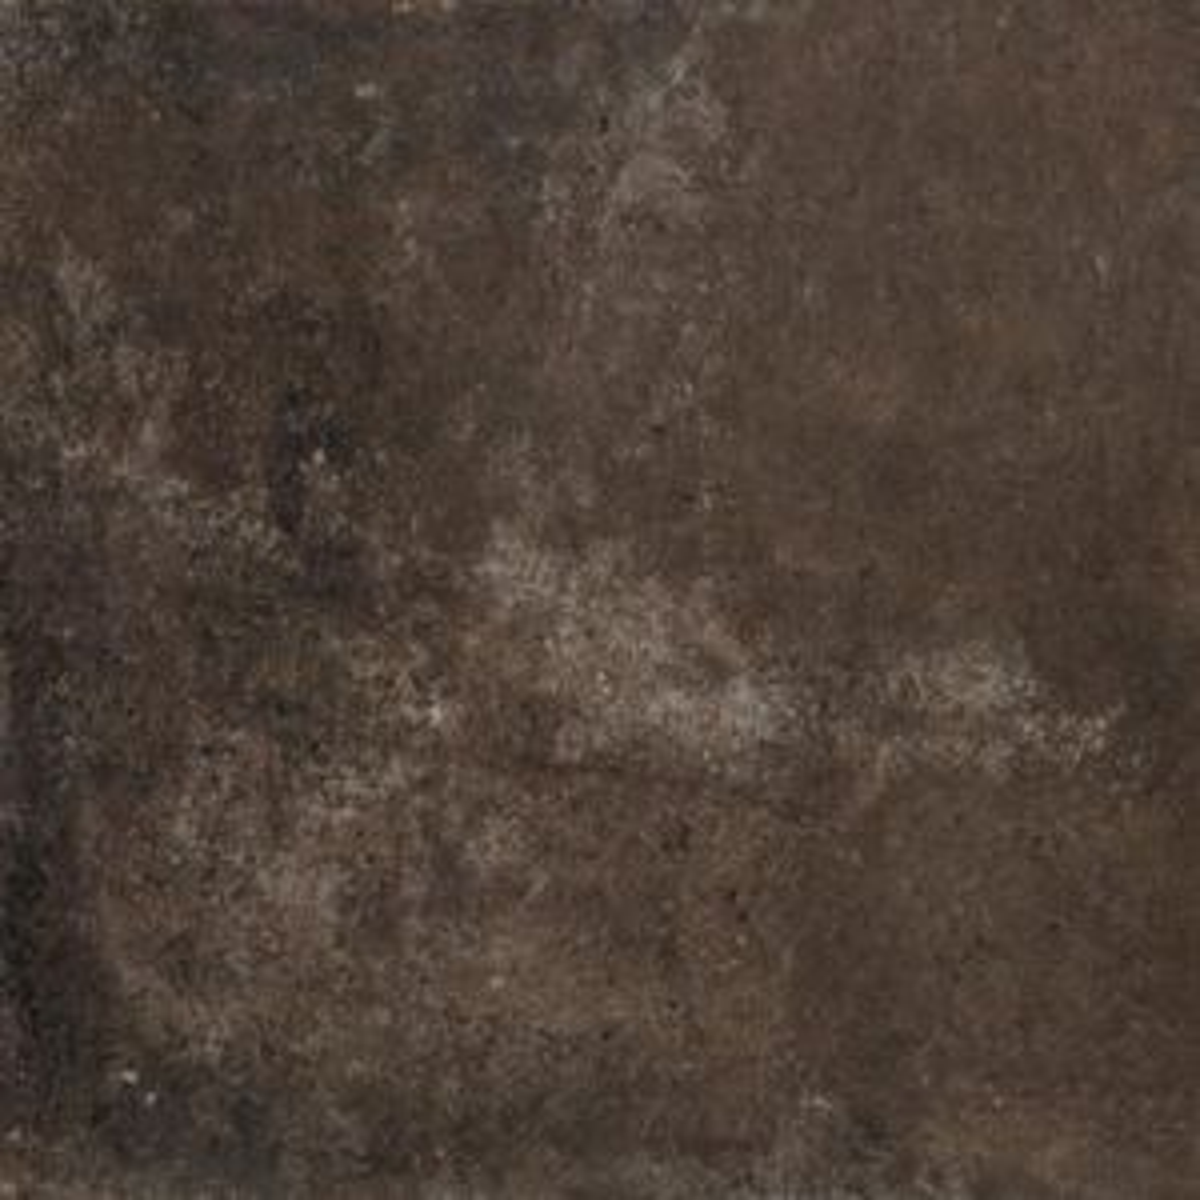 RAK Maremma Dark Brown Matt Tile 600 x 600mm